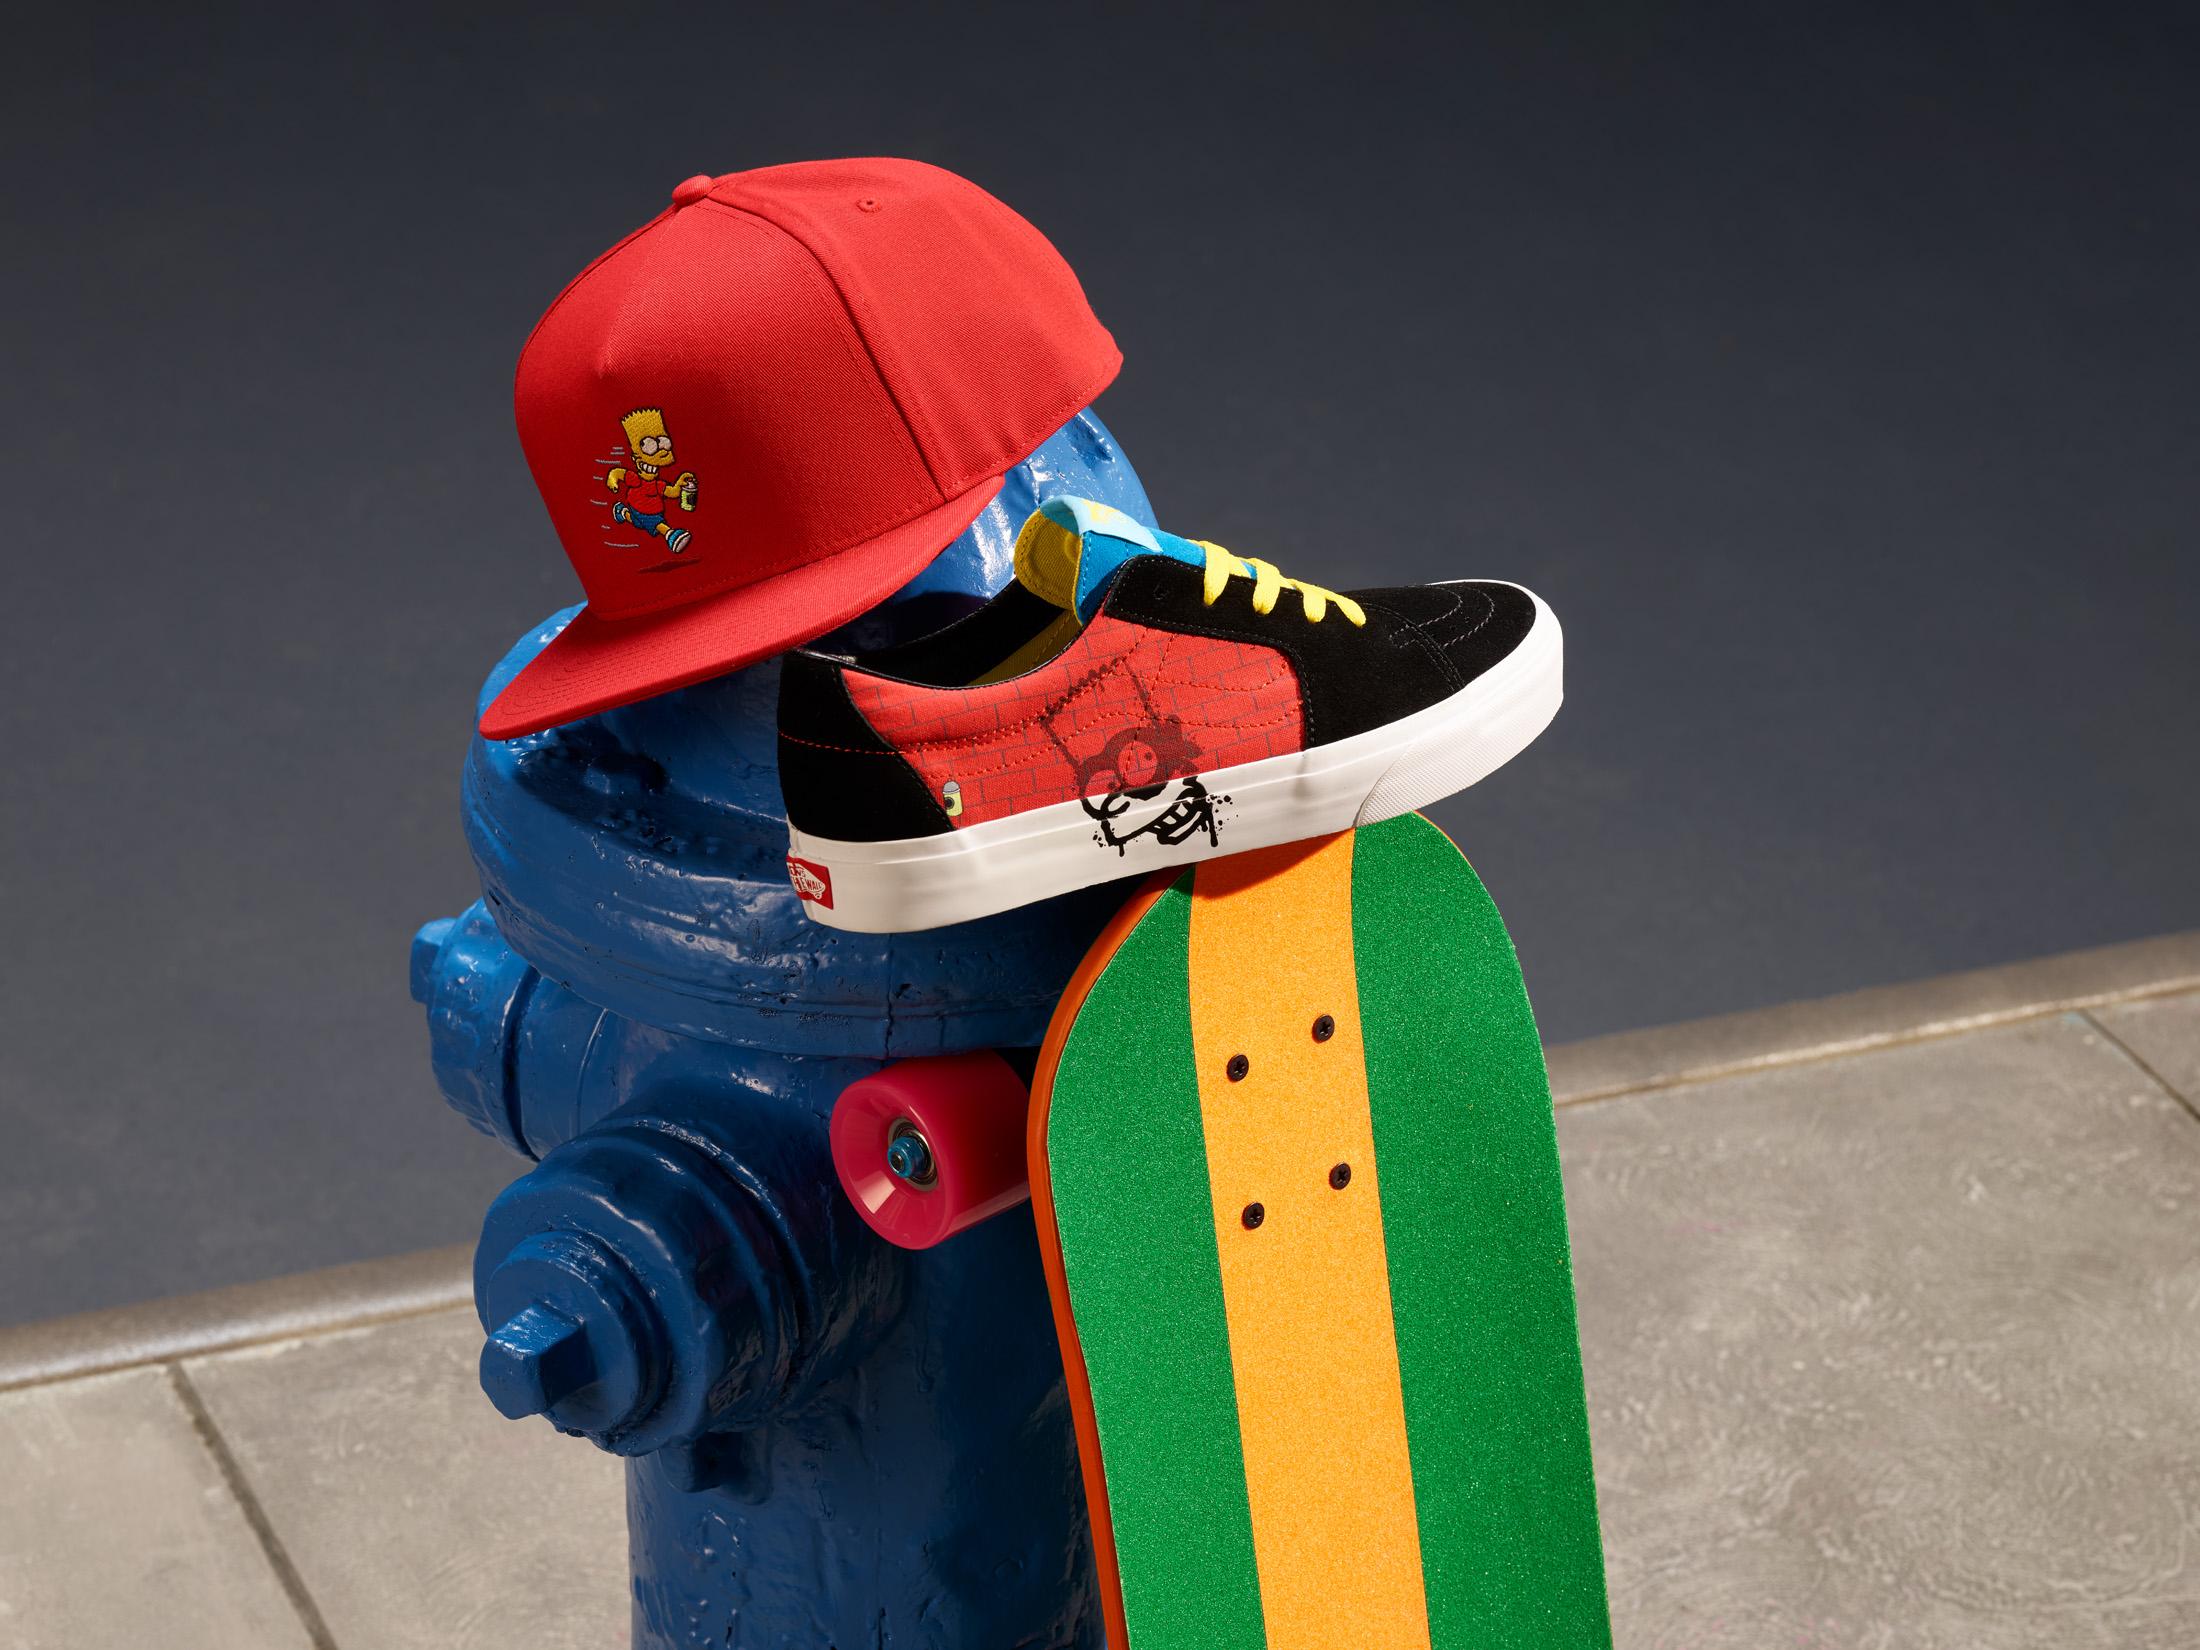 The Simpsons: H σειρά που σημάδεψε την pop κουλτούρα των 90s τώρα έχει τα sneakers που της αξίζουν